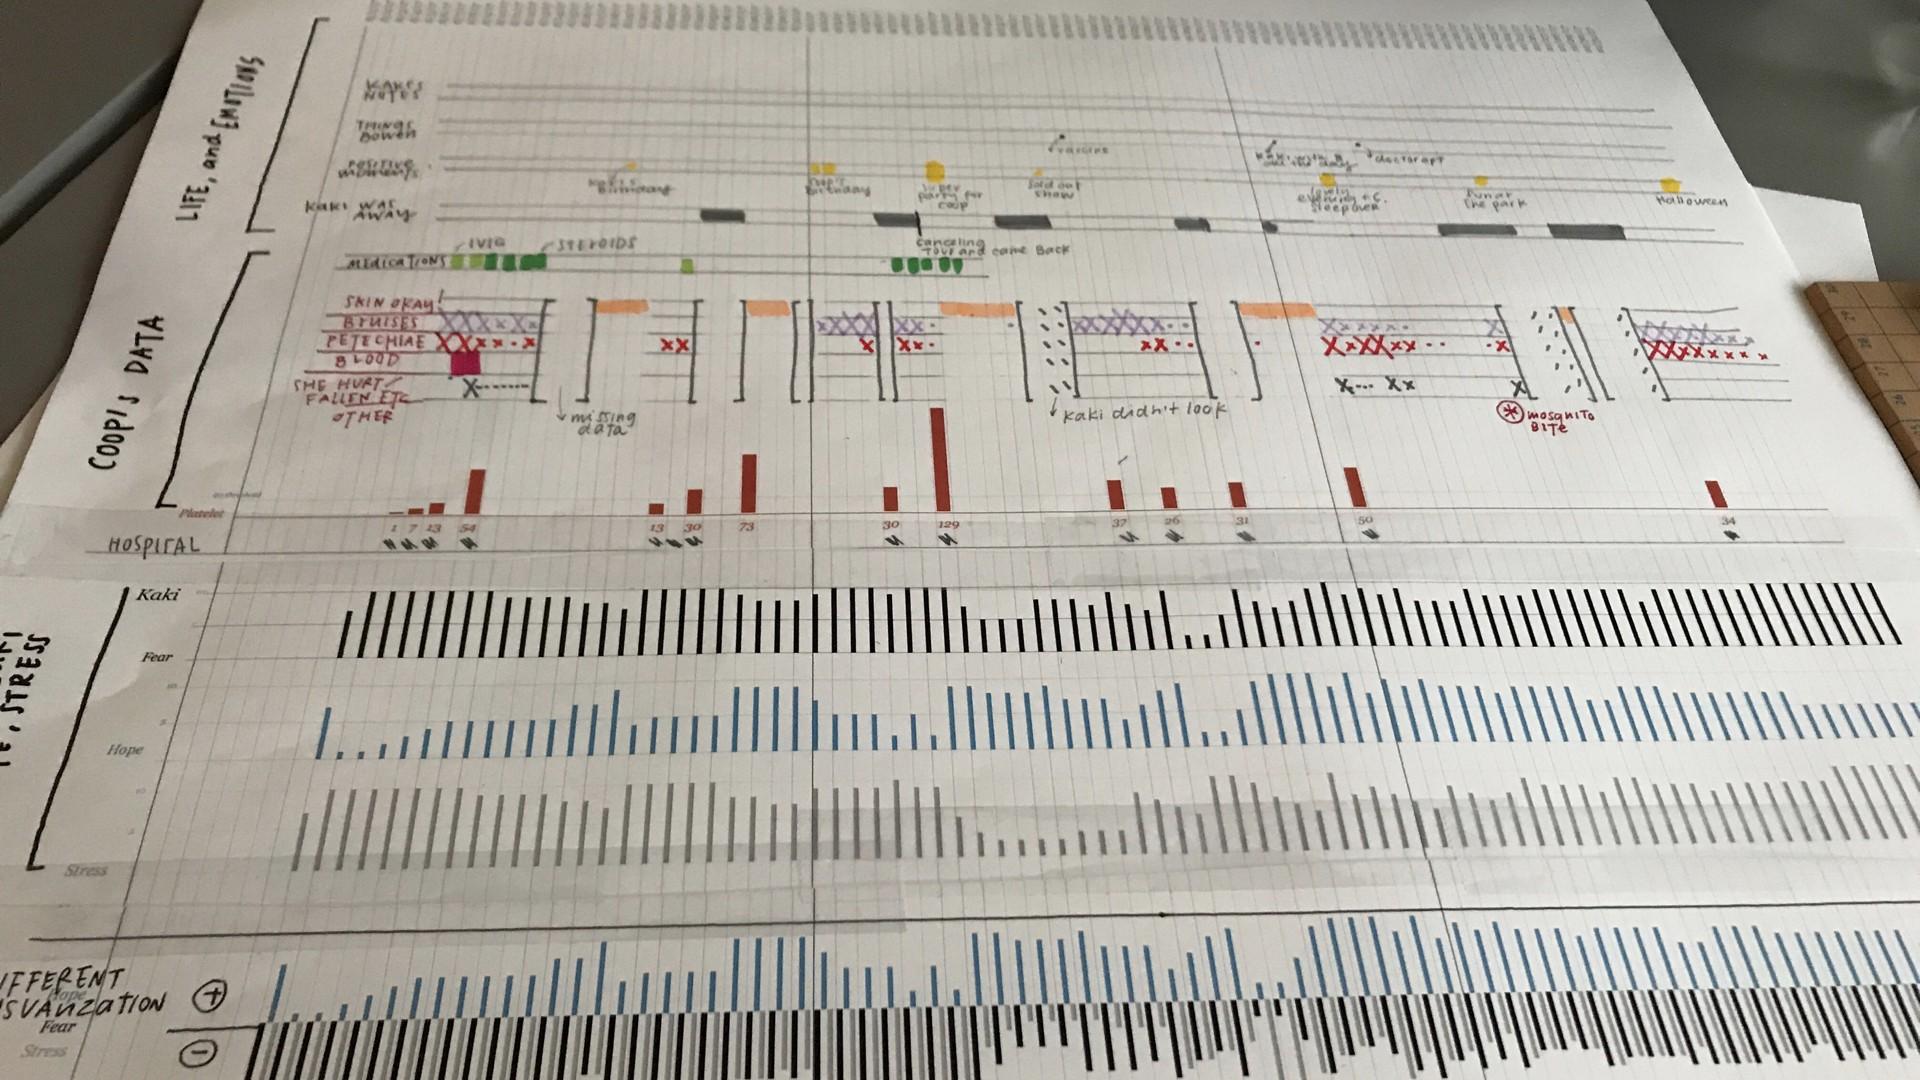 My working sheet as interpreting Kaki's data collection